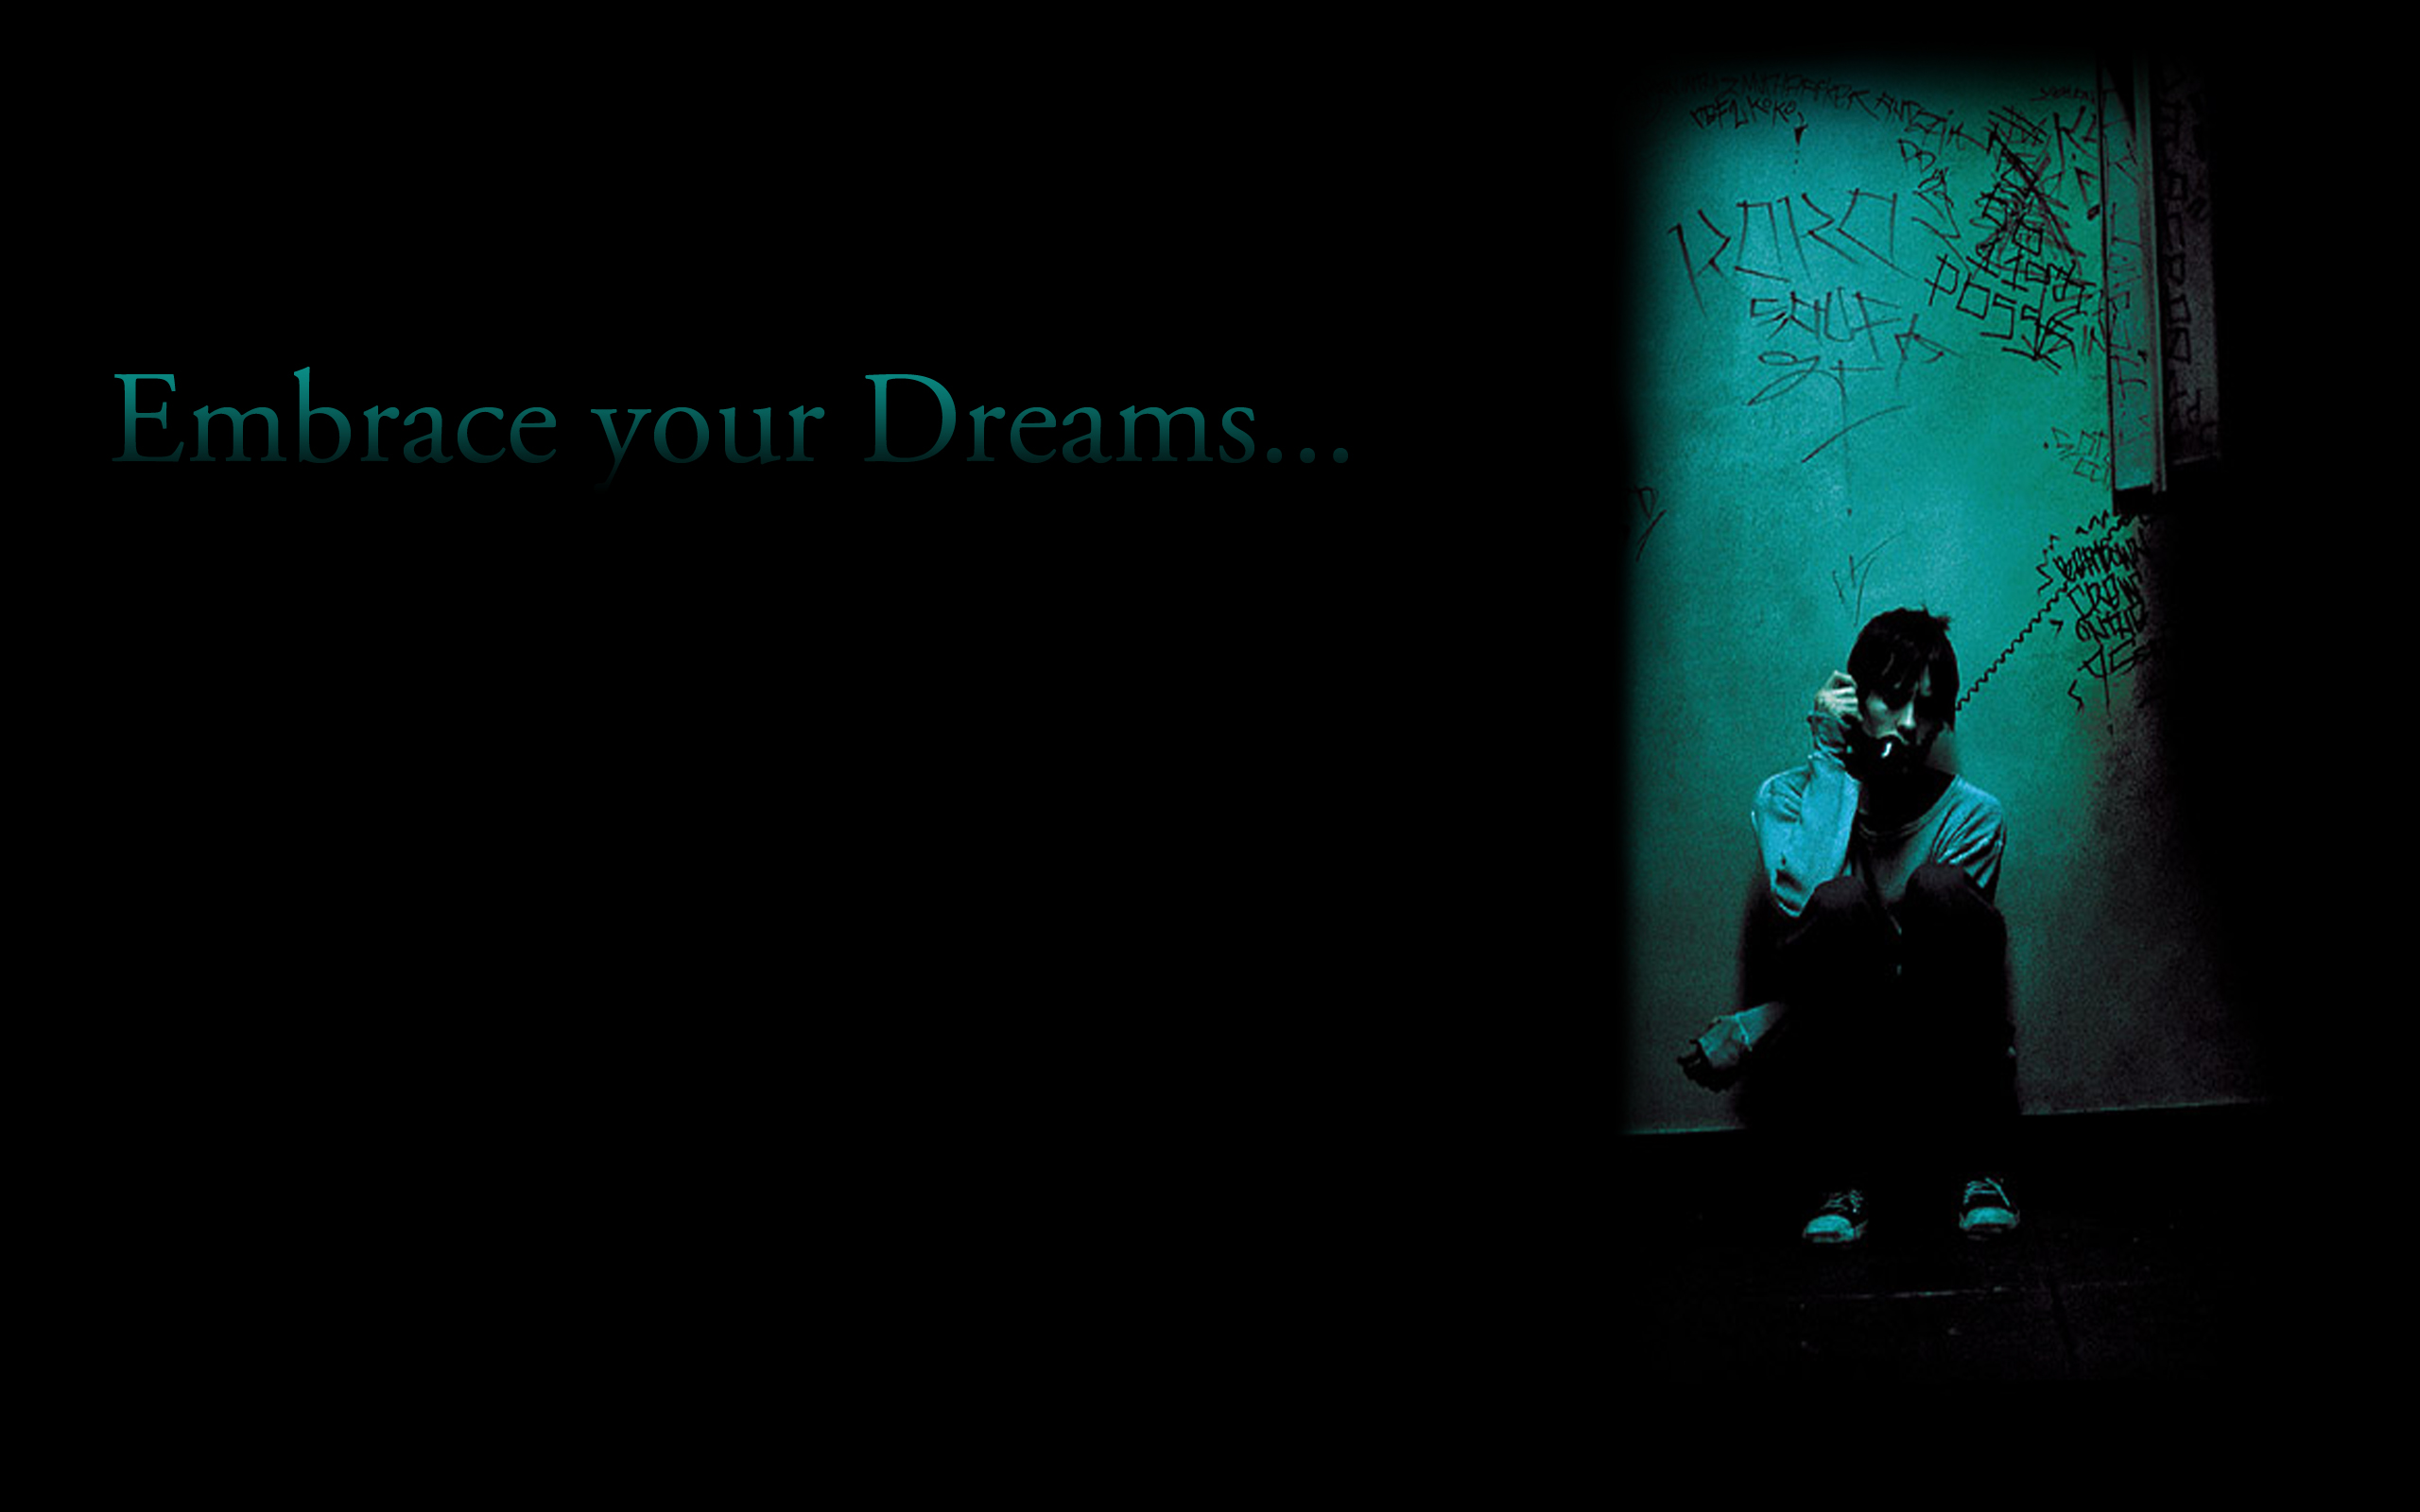 Requiem for a Dream I by MrLoLLiPoP93 on DeviantArt